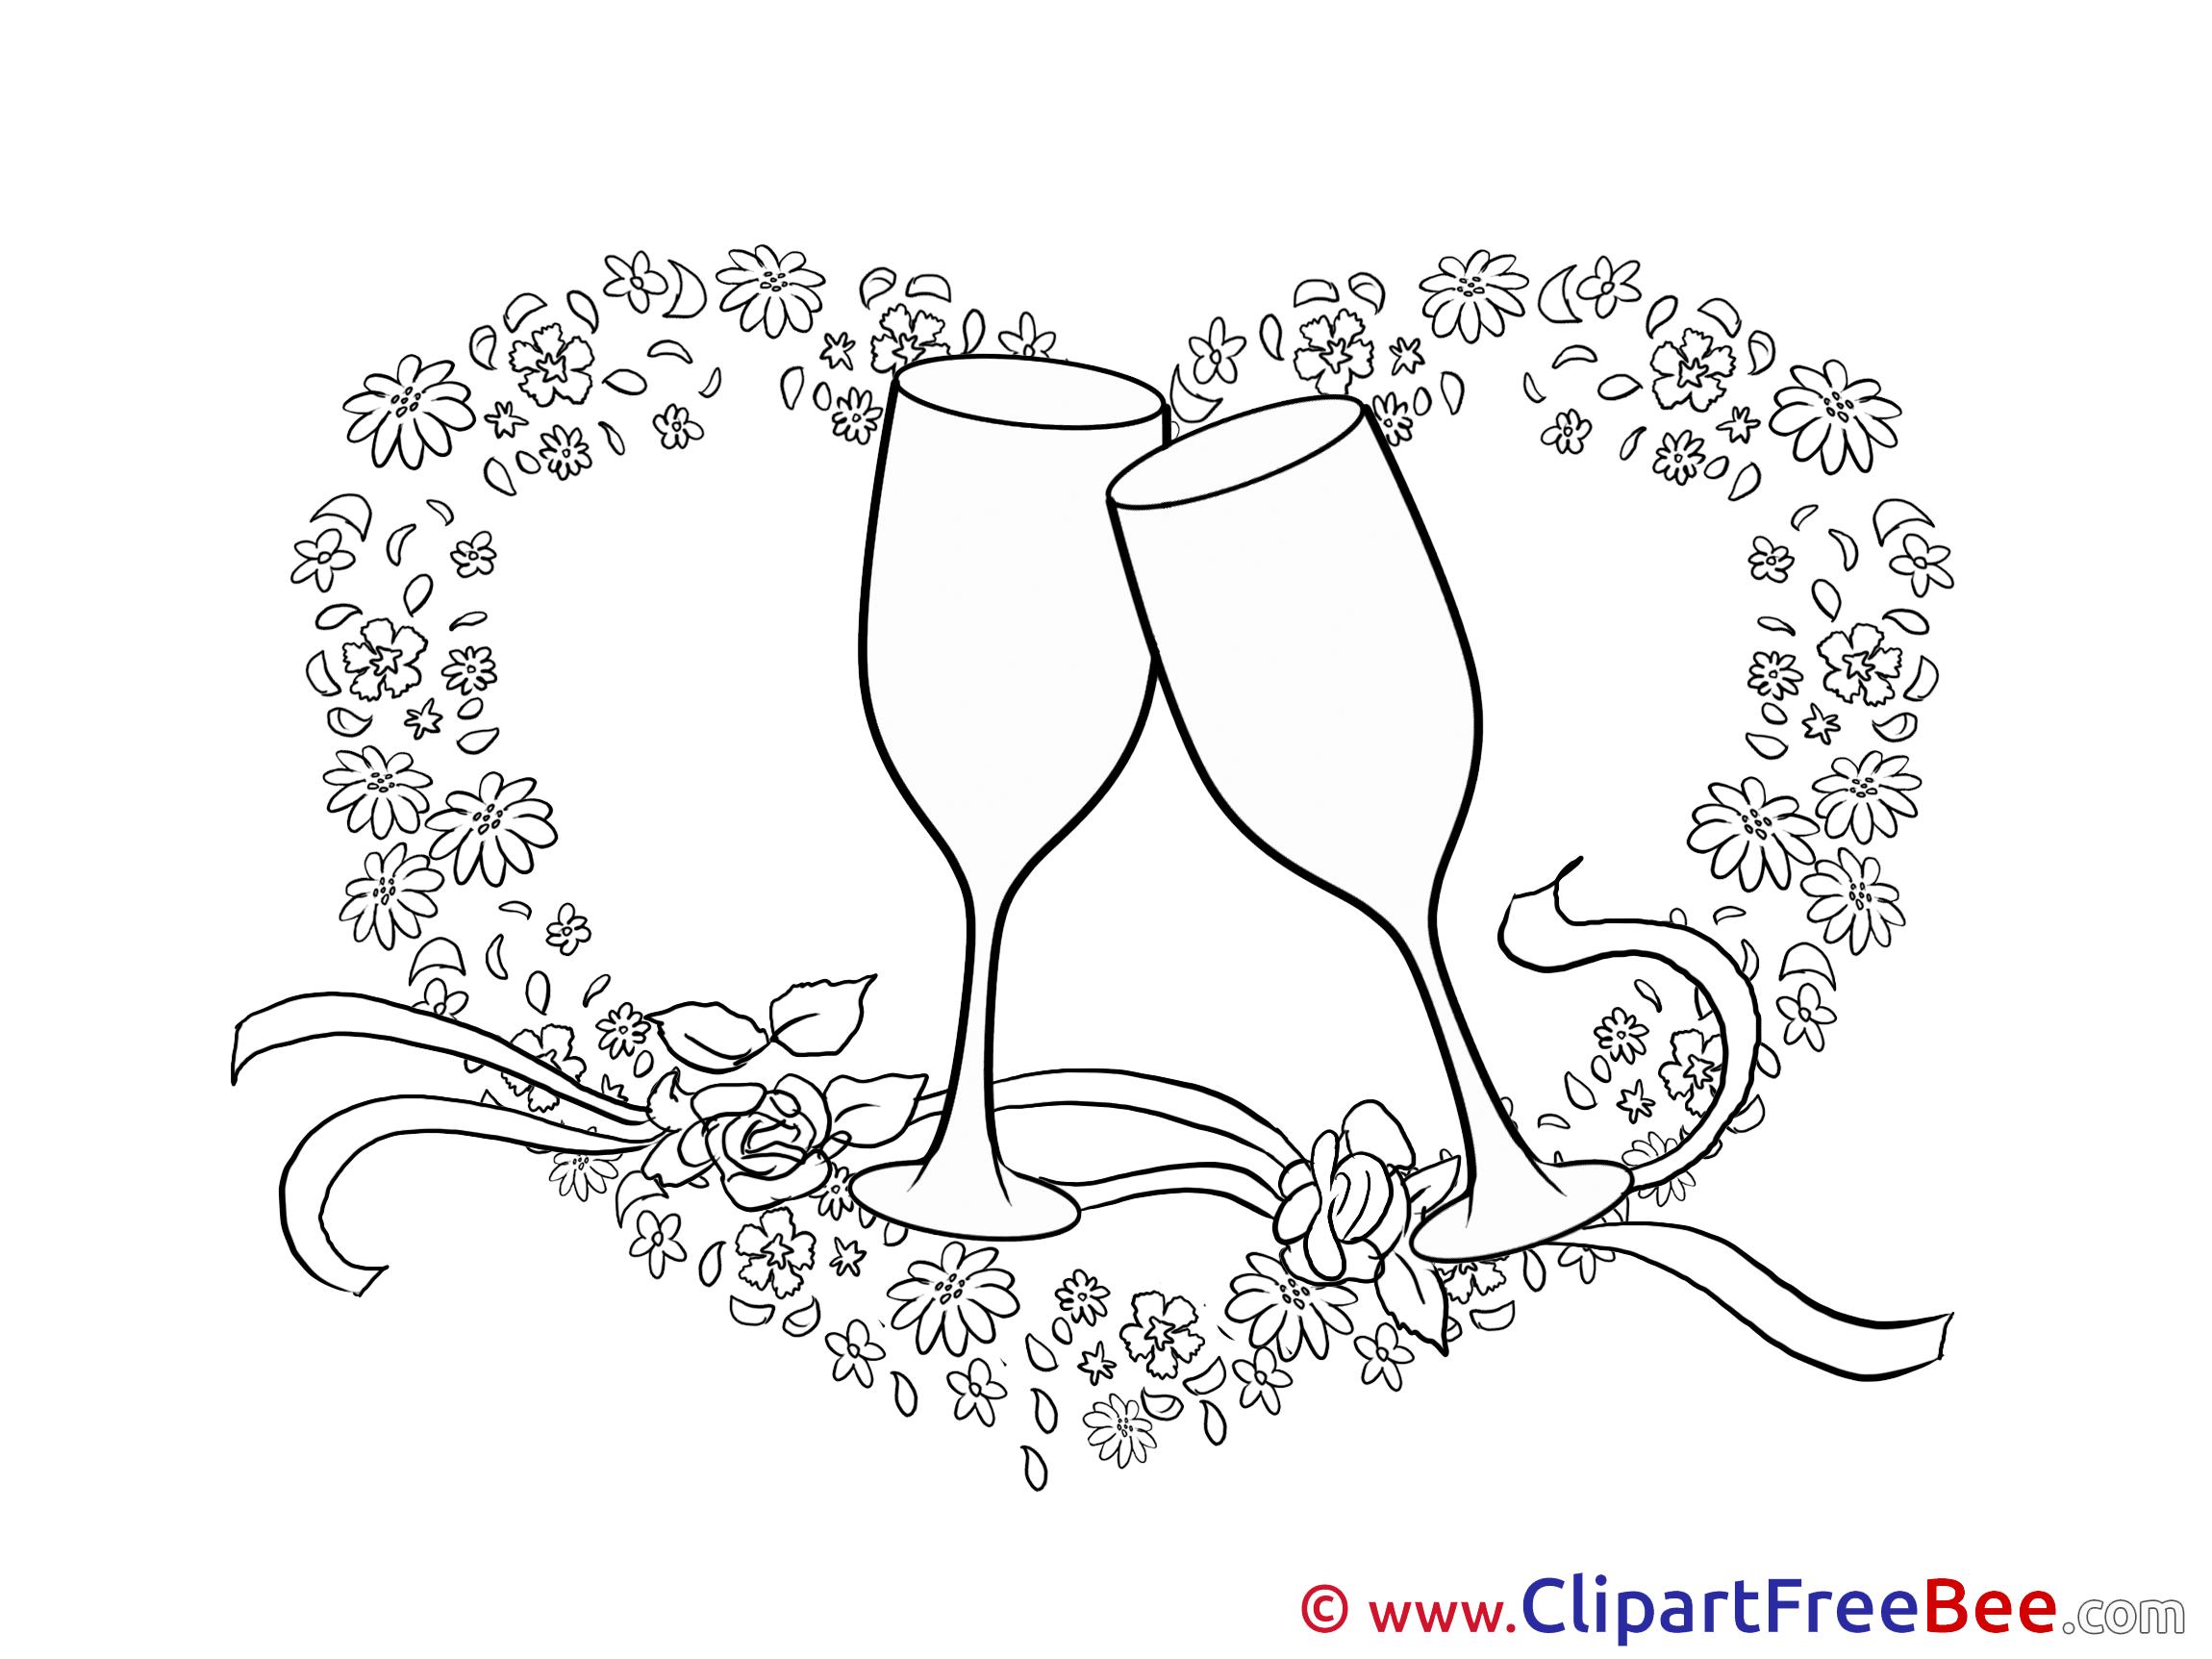 Glasses Heart Wedding free Illustration